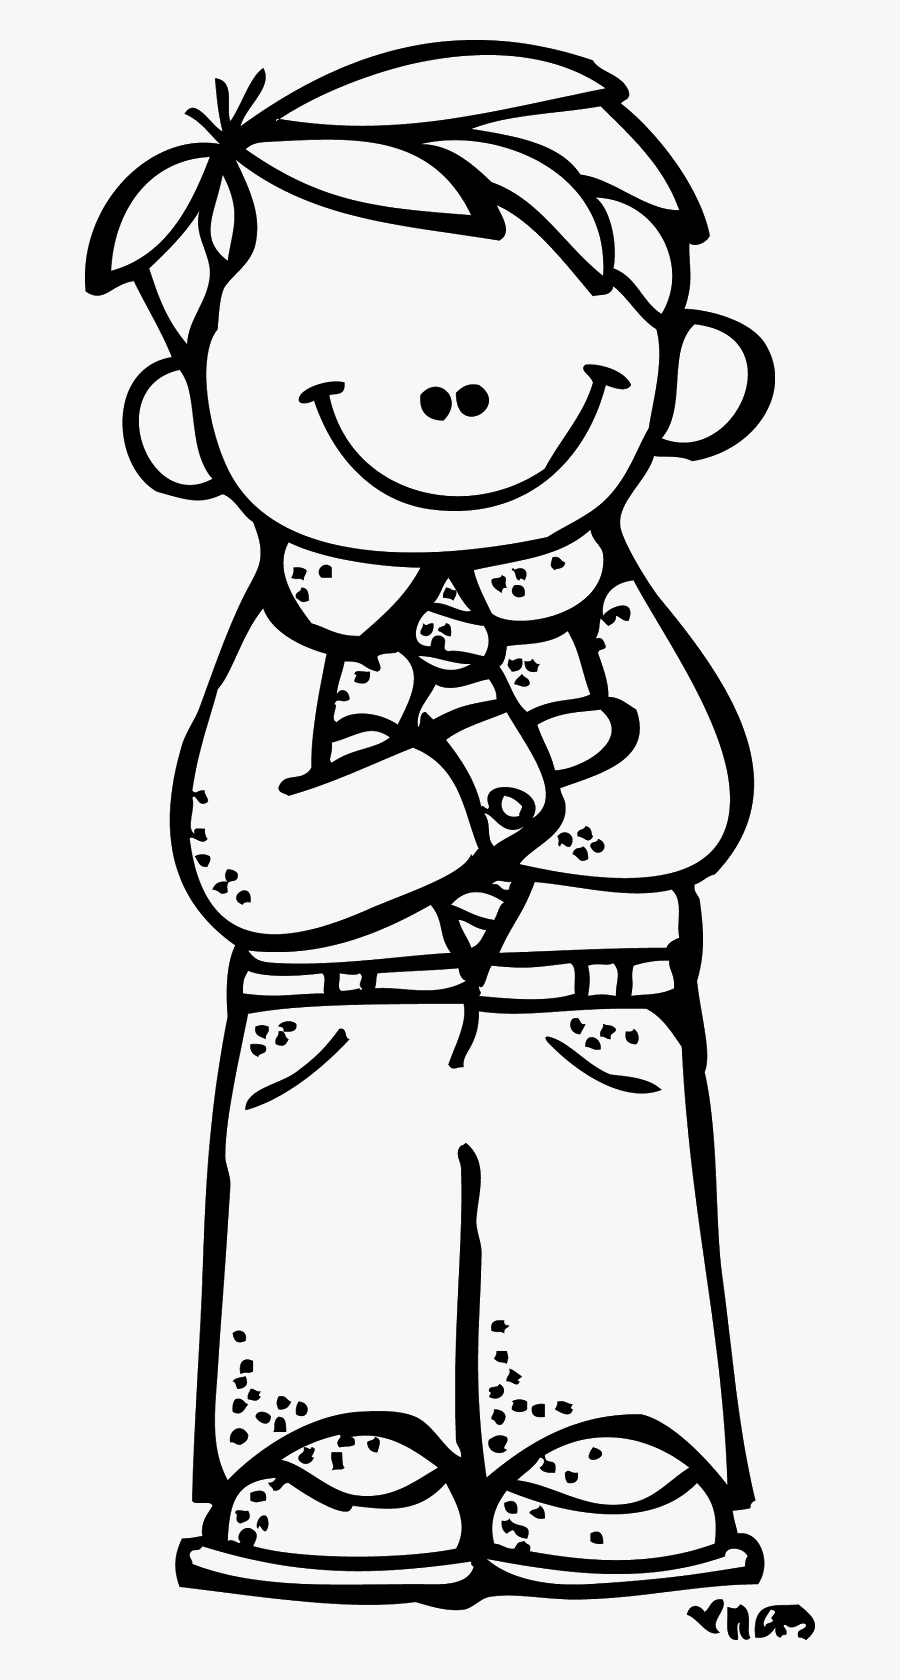 Clip Art Sacrament Lds Clipart - Melonheadz Boy Clipart Black And White, Transparent Clipart